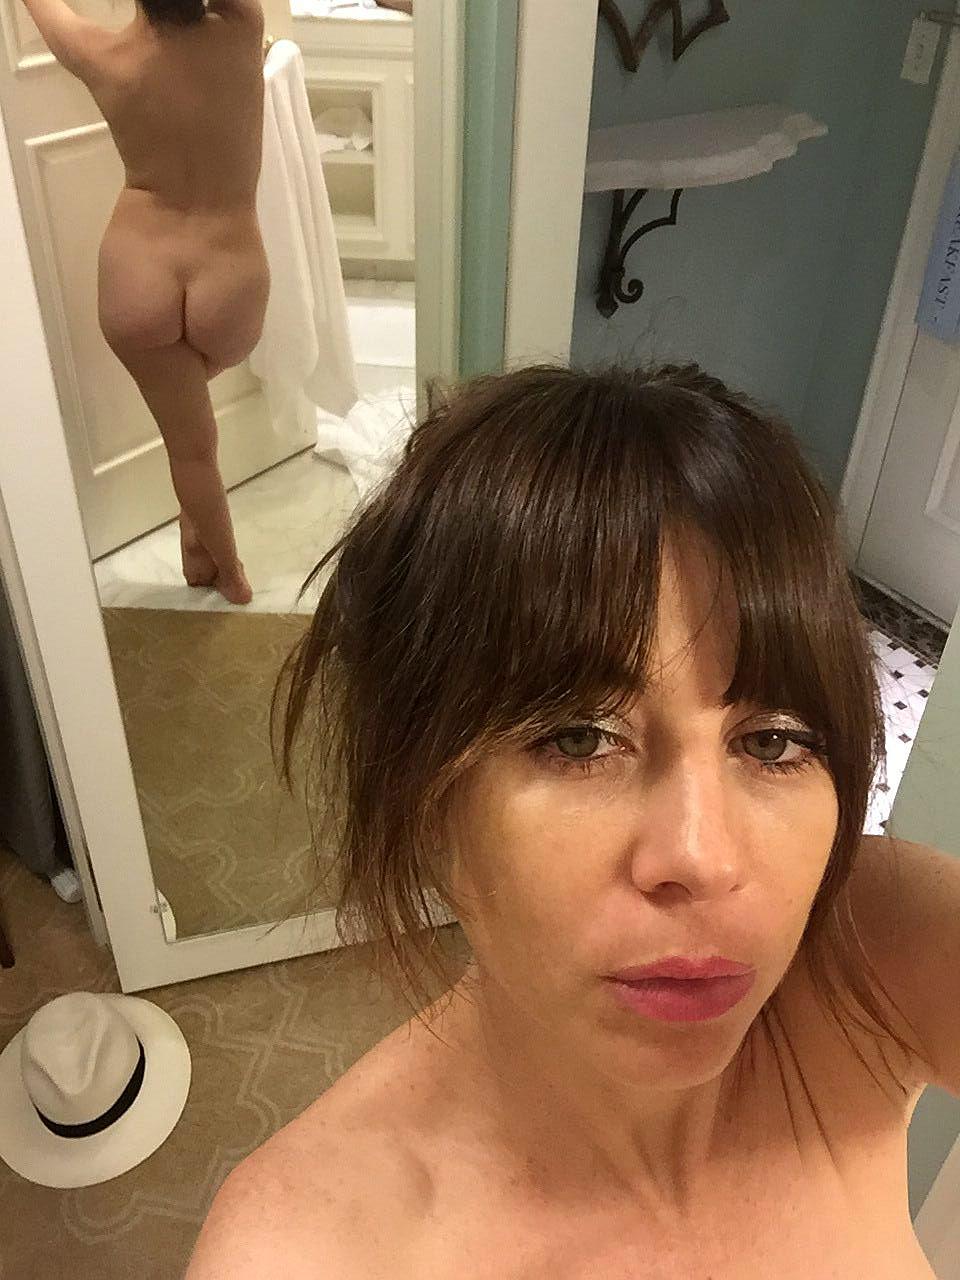 nudes (33 photos), Ass Celebrites picture